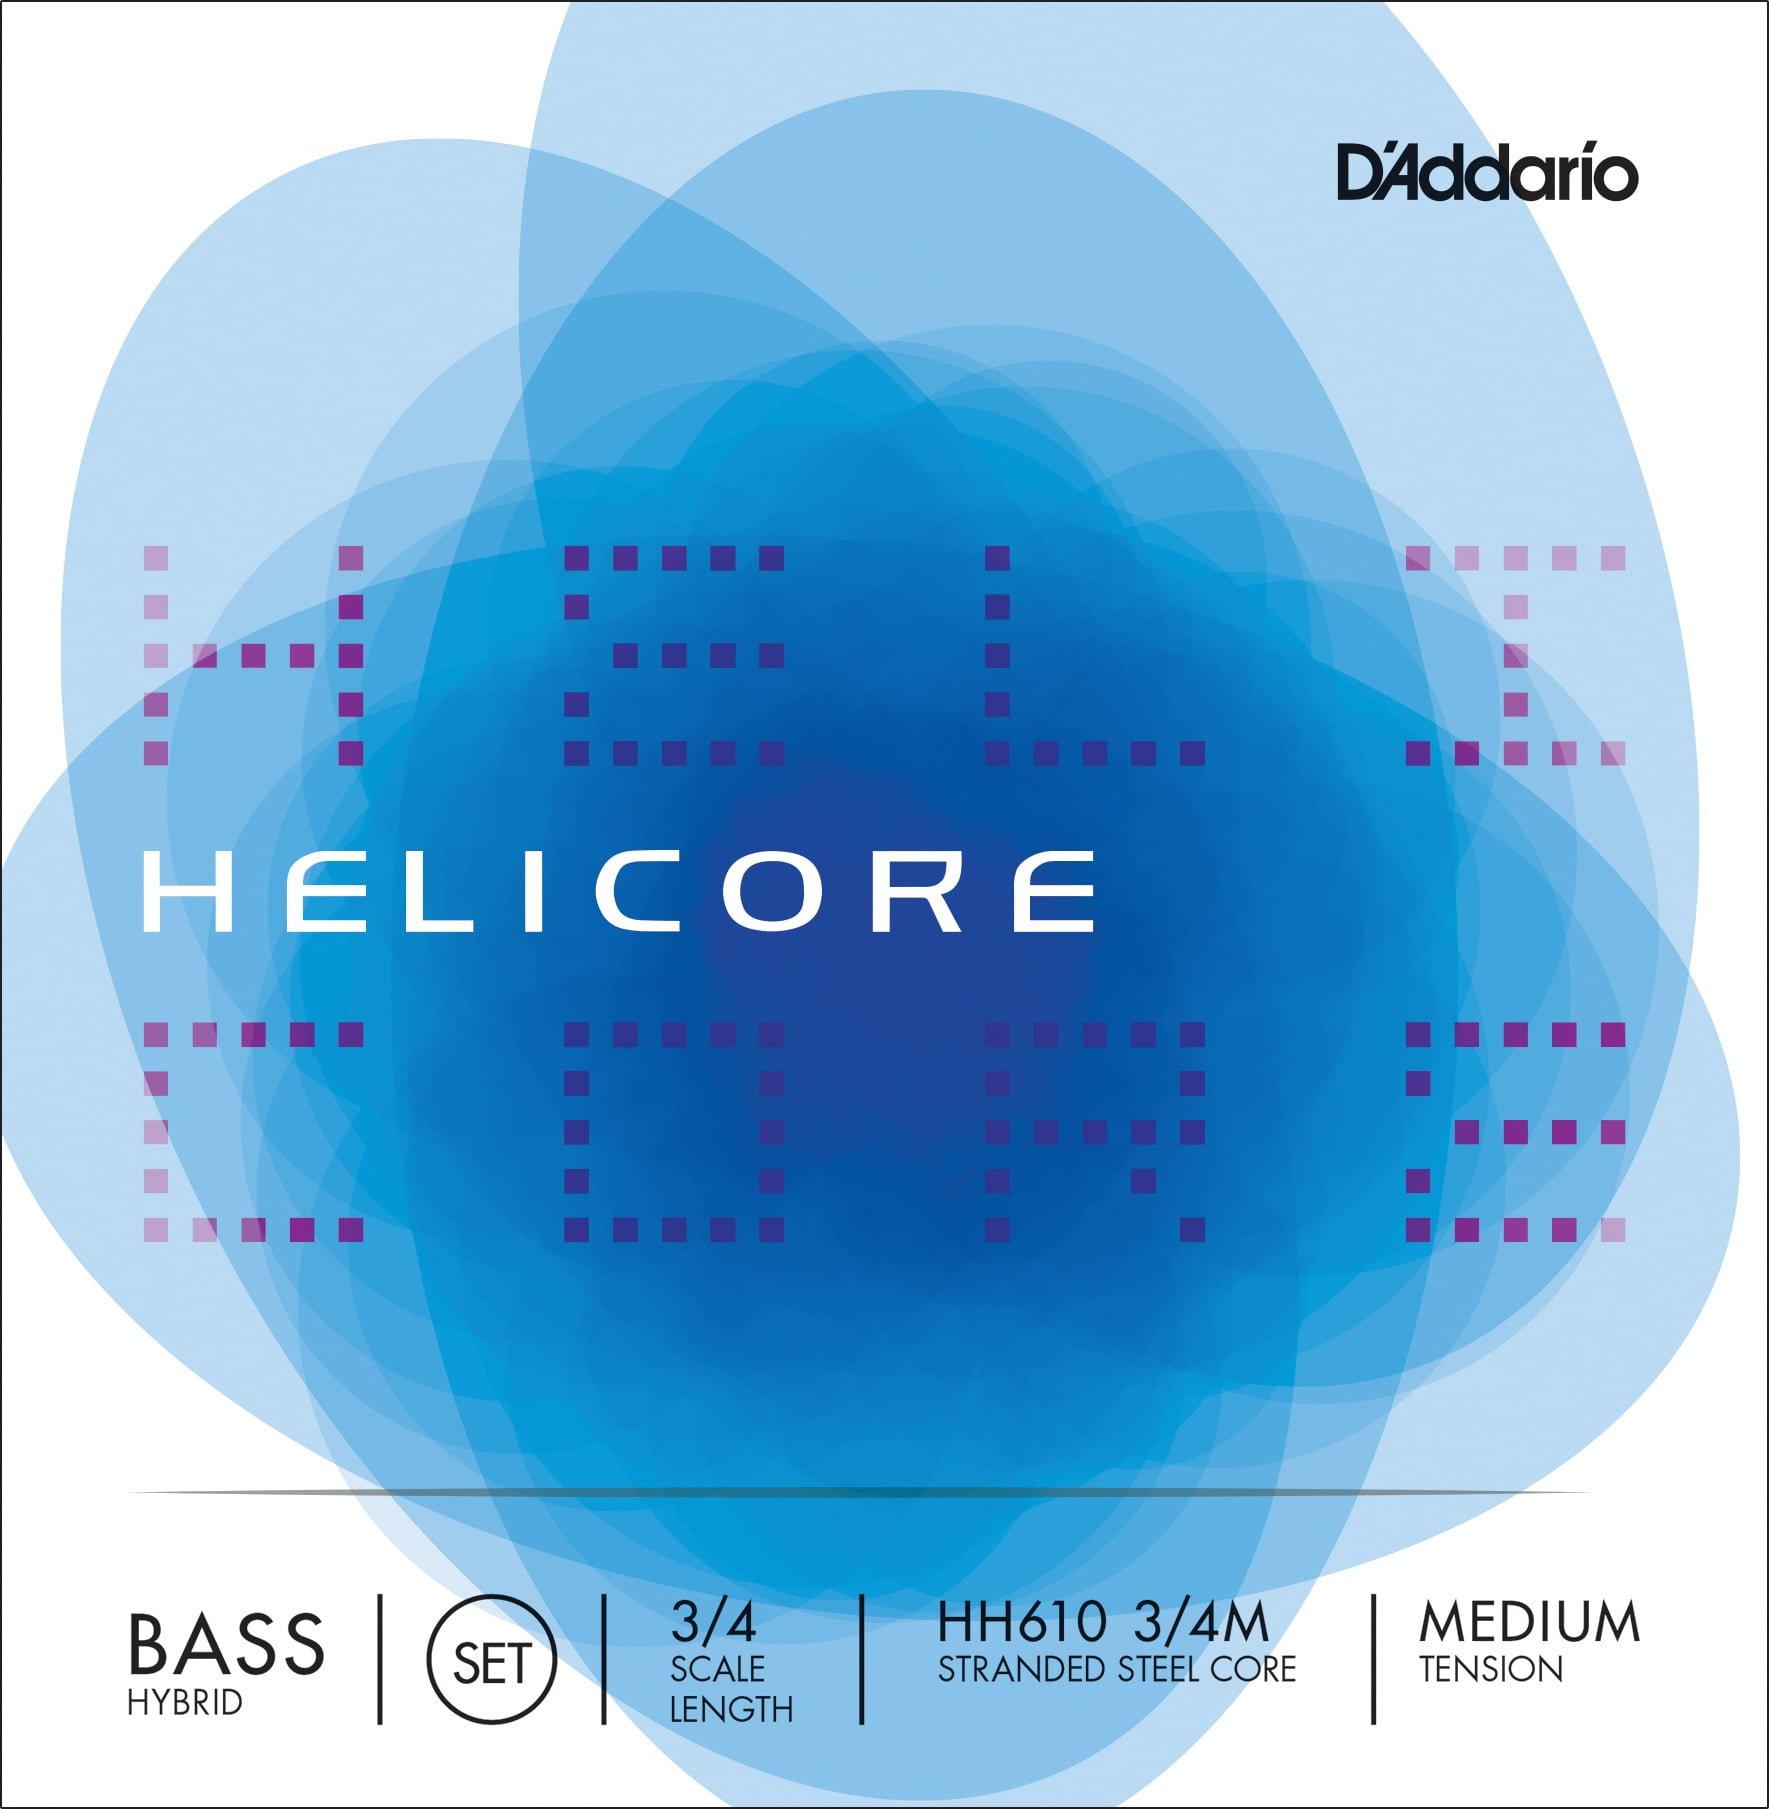 Helicore Hybrid Double Bass Set of Strings 3/4 Medium